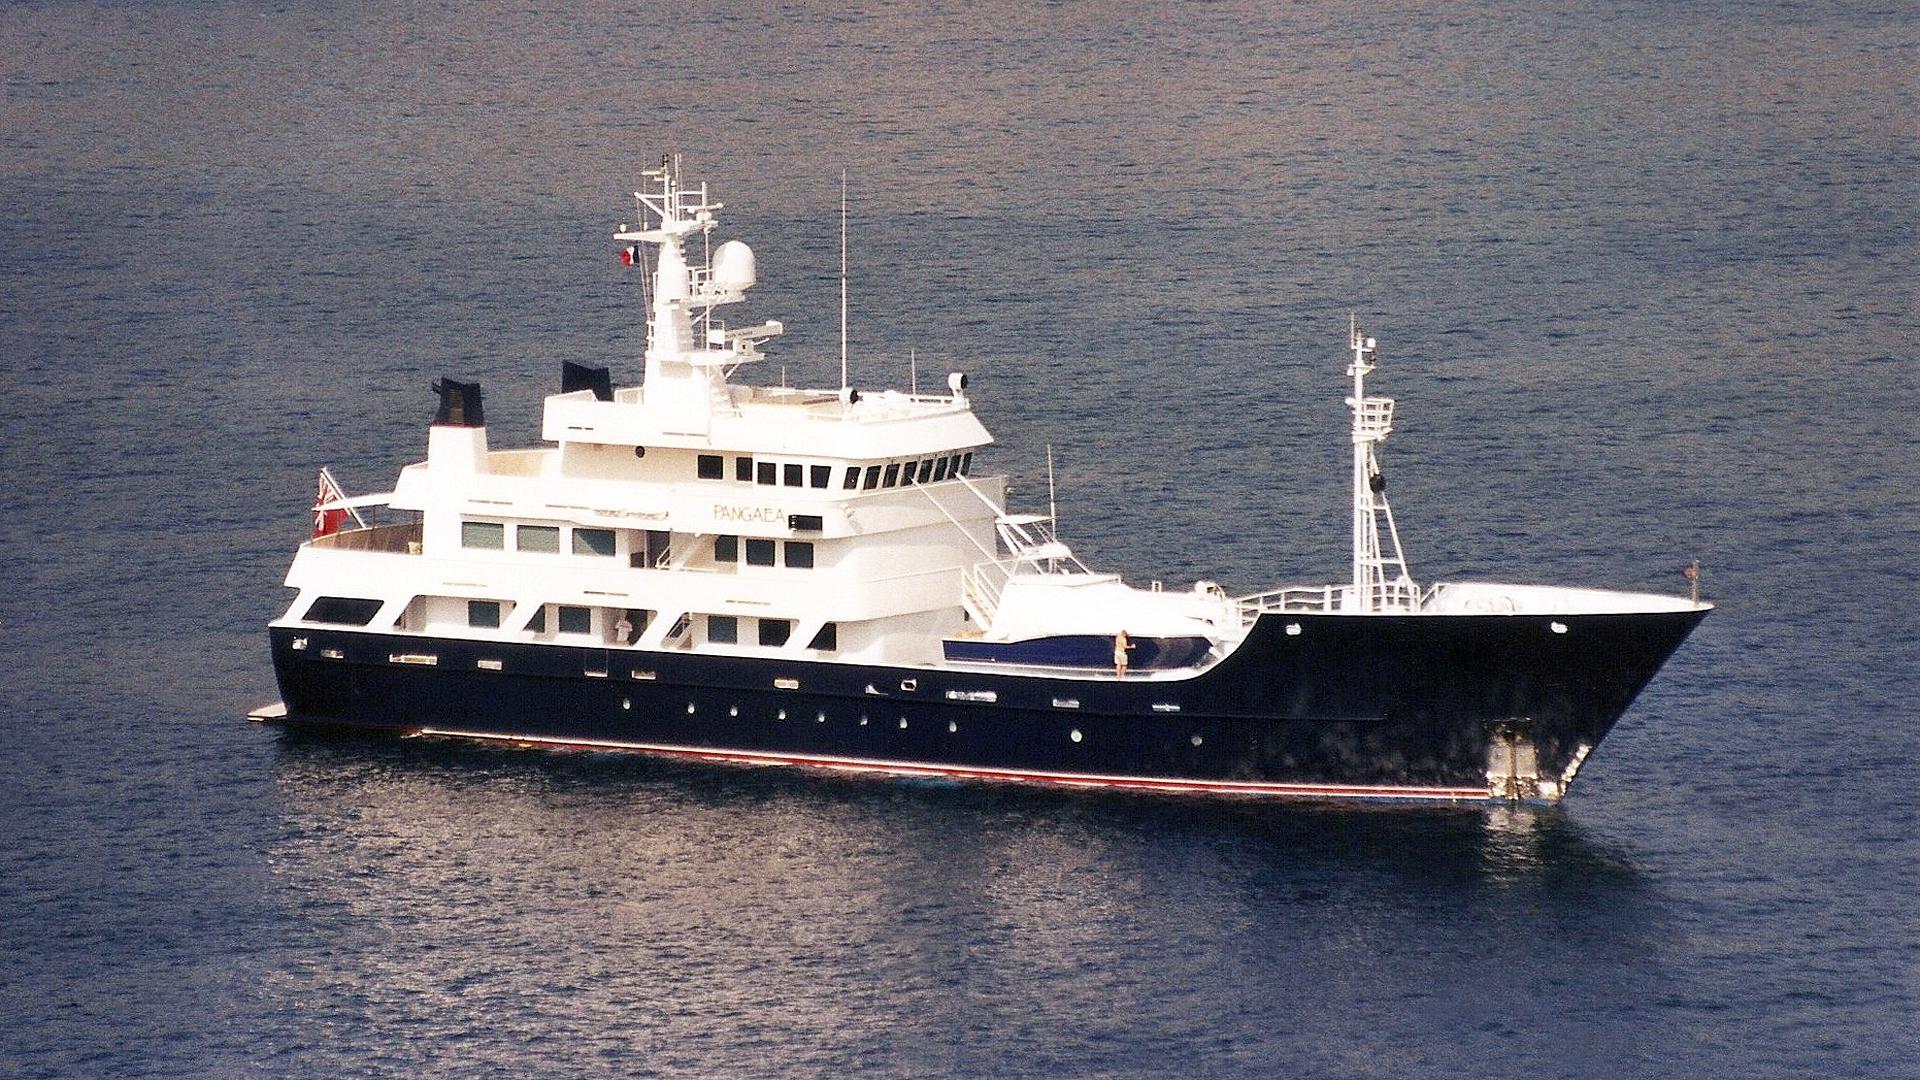 pangaea explorer yacht halter 1999 58m half profile before refit